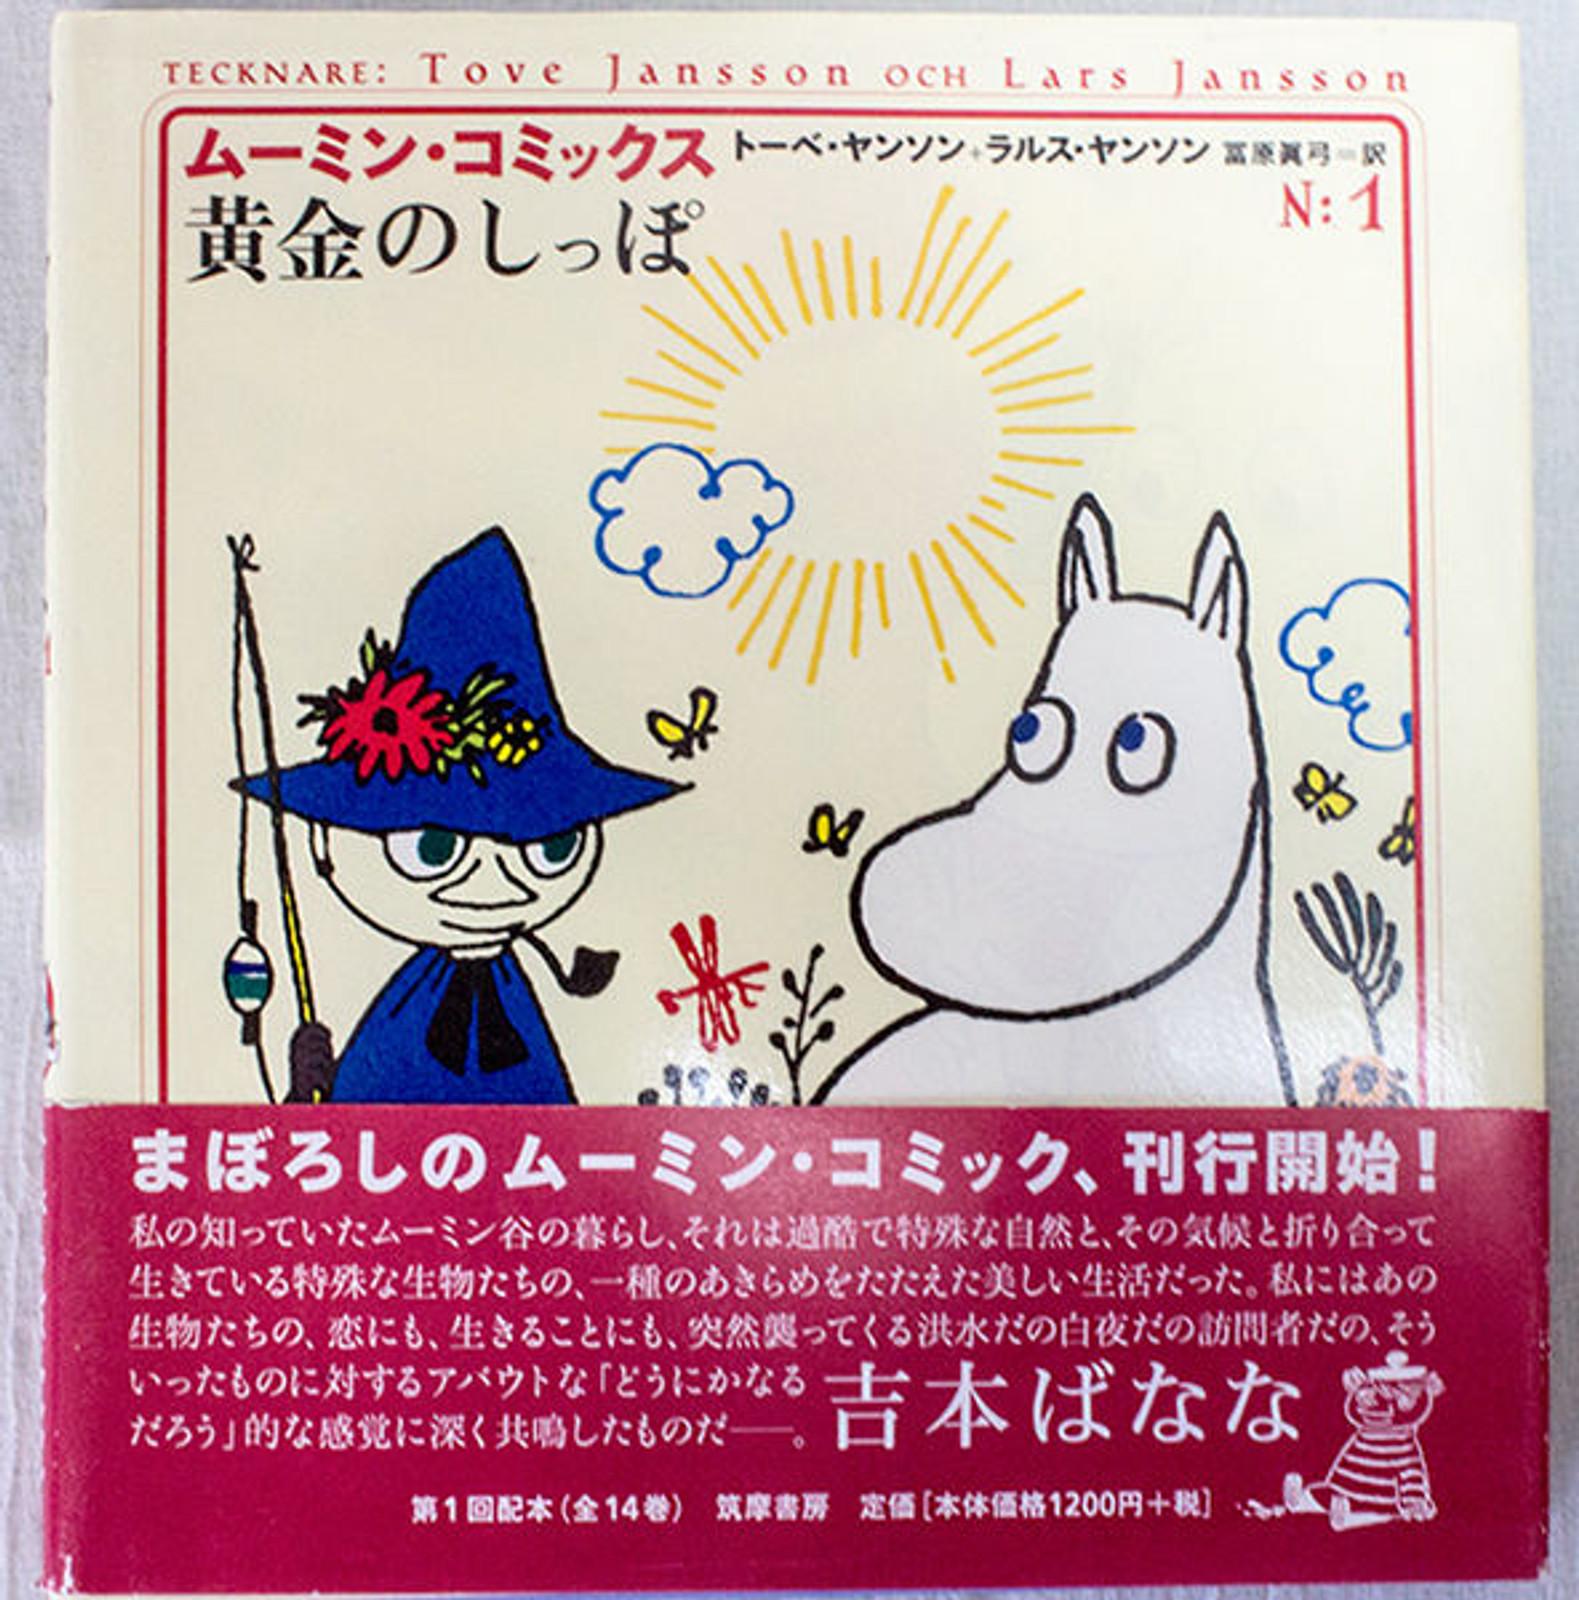 Moomin  Japanese Comics N:1 Golden Tales Tove Jansson Lars Jansson JAPAN MANGA